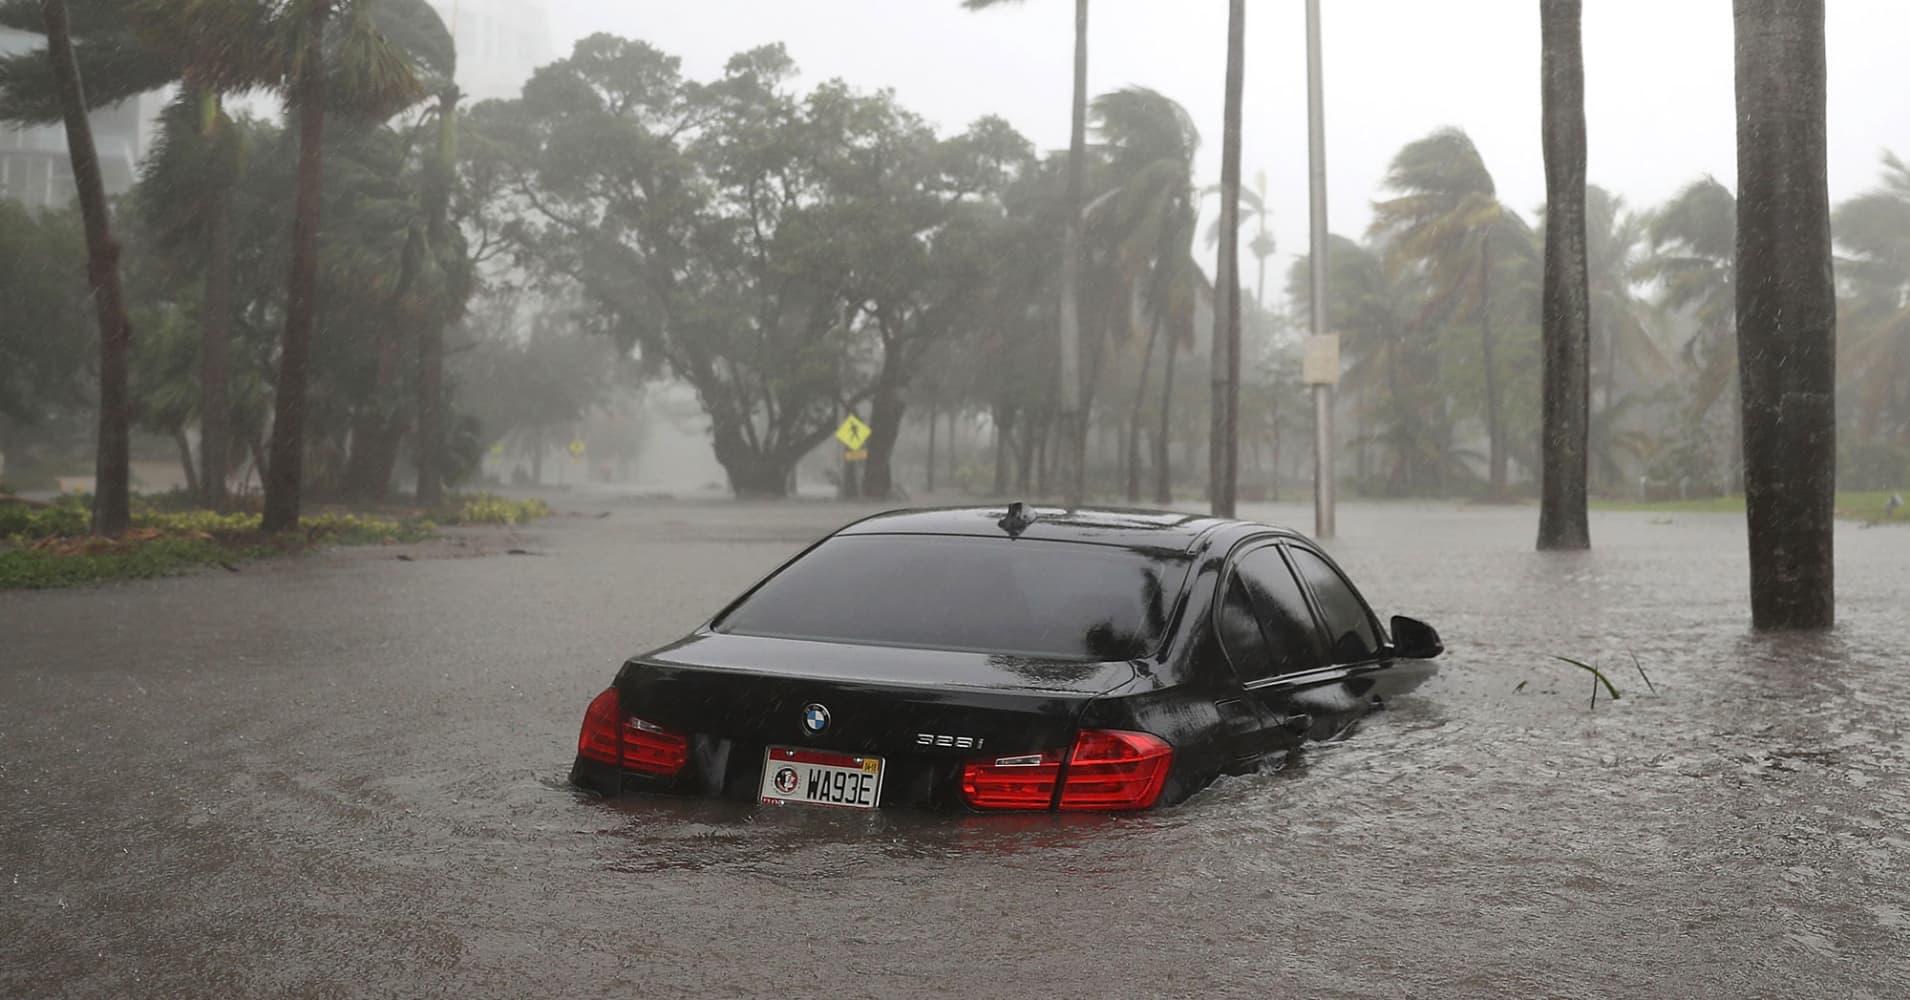 104730254-gettyimages-845353800-flood-car.1910x1000